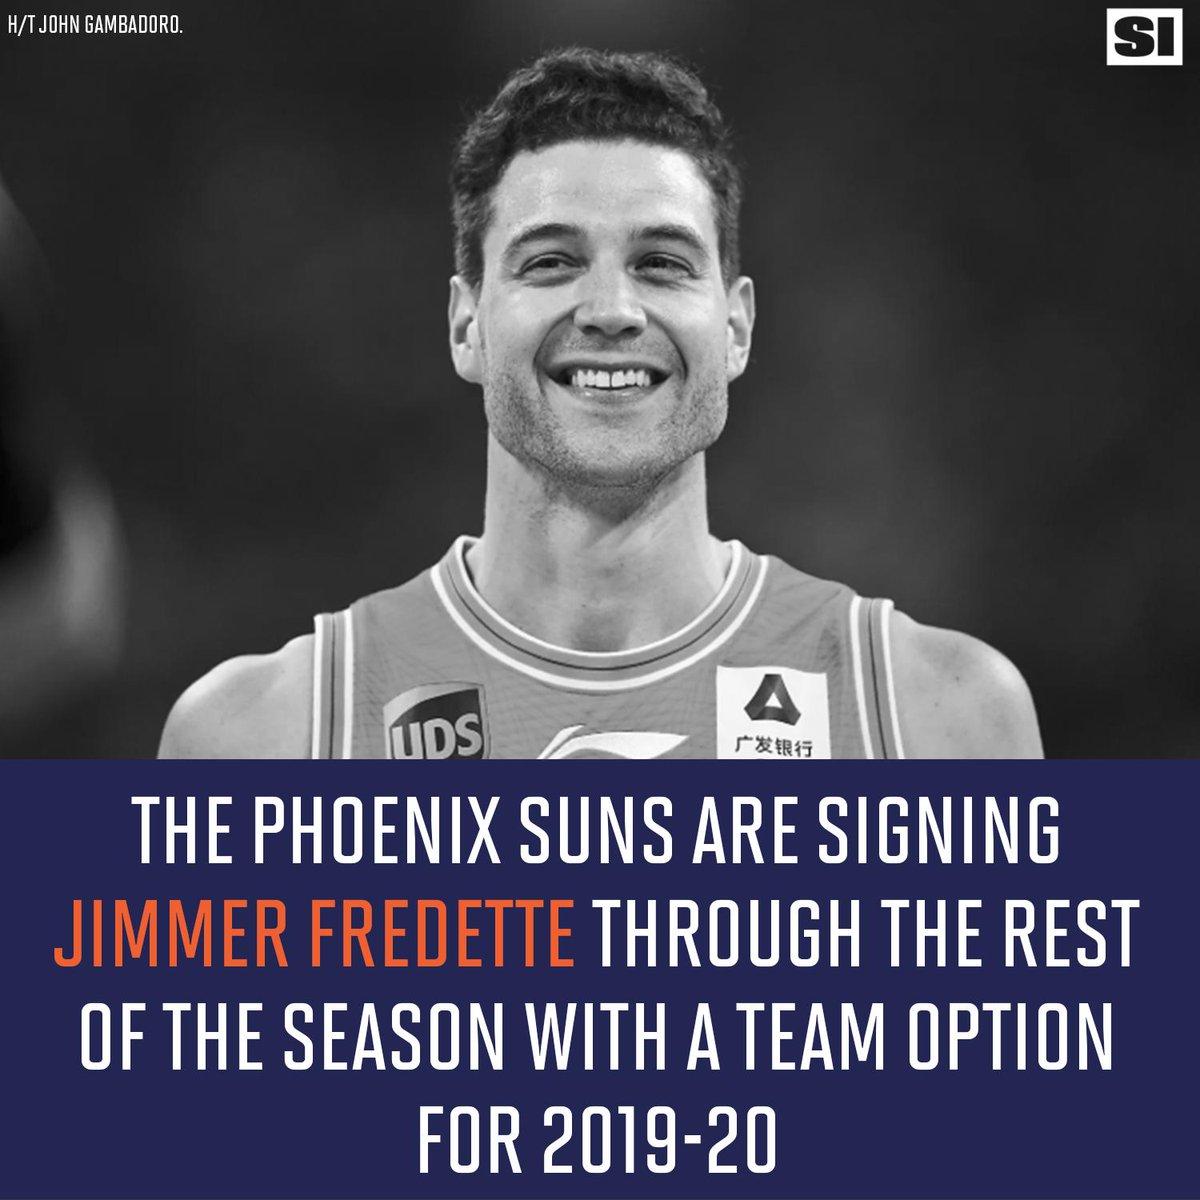 Jimmer is BACK